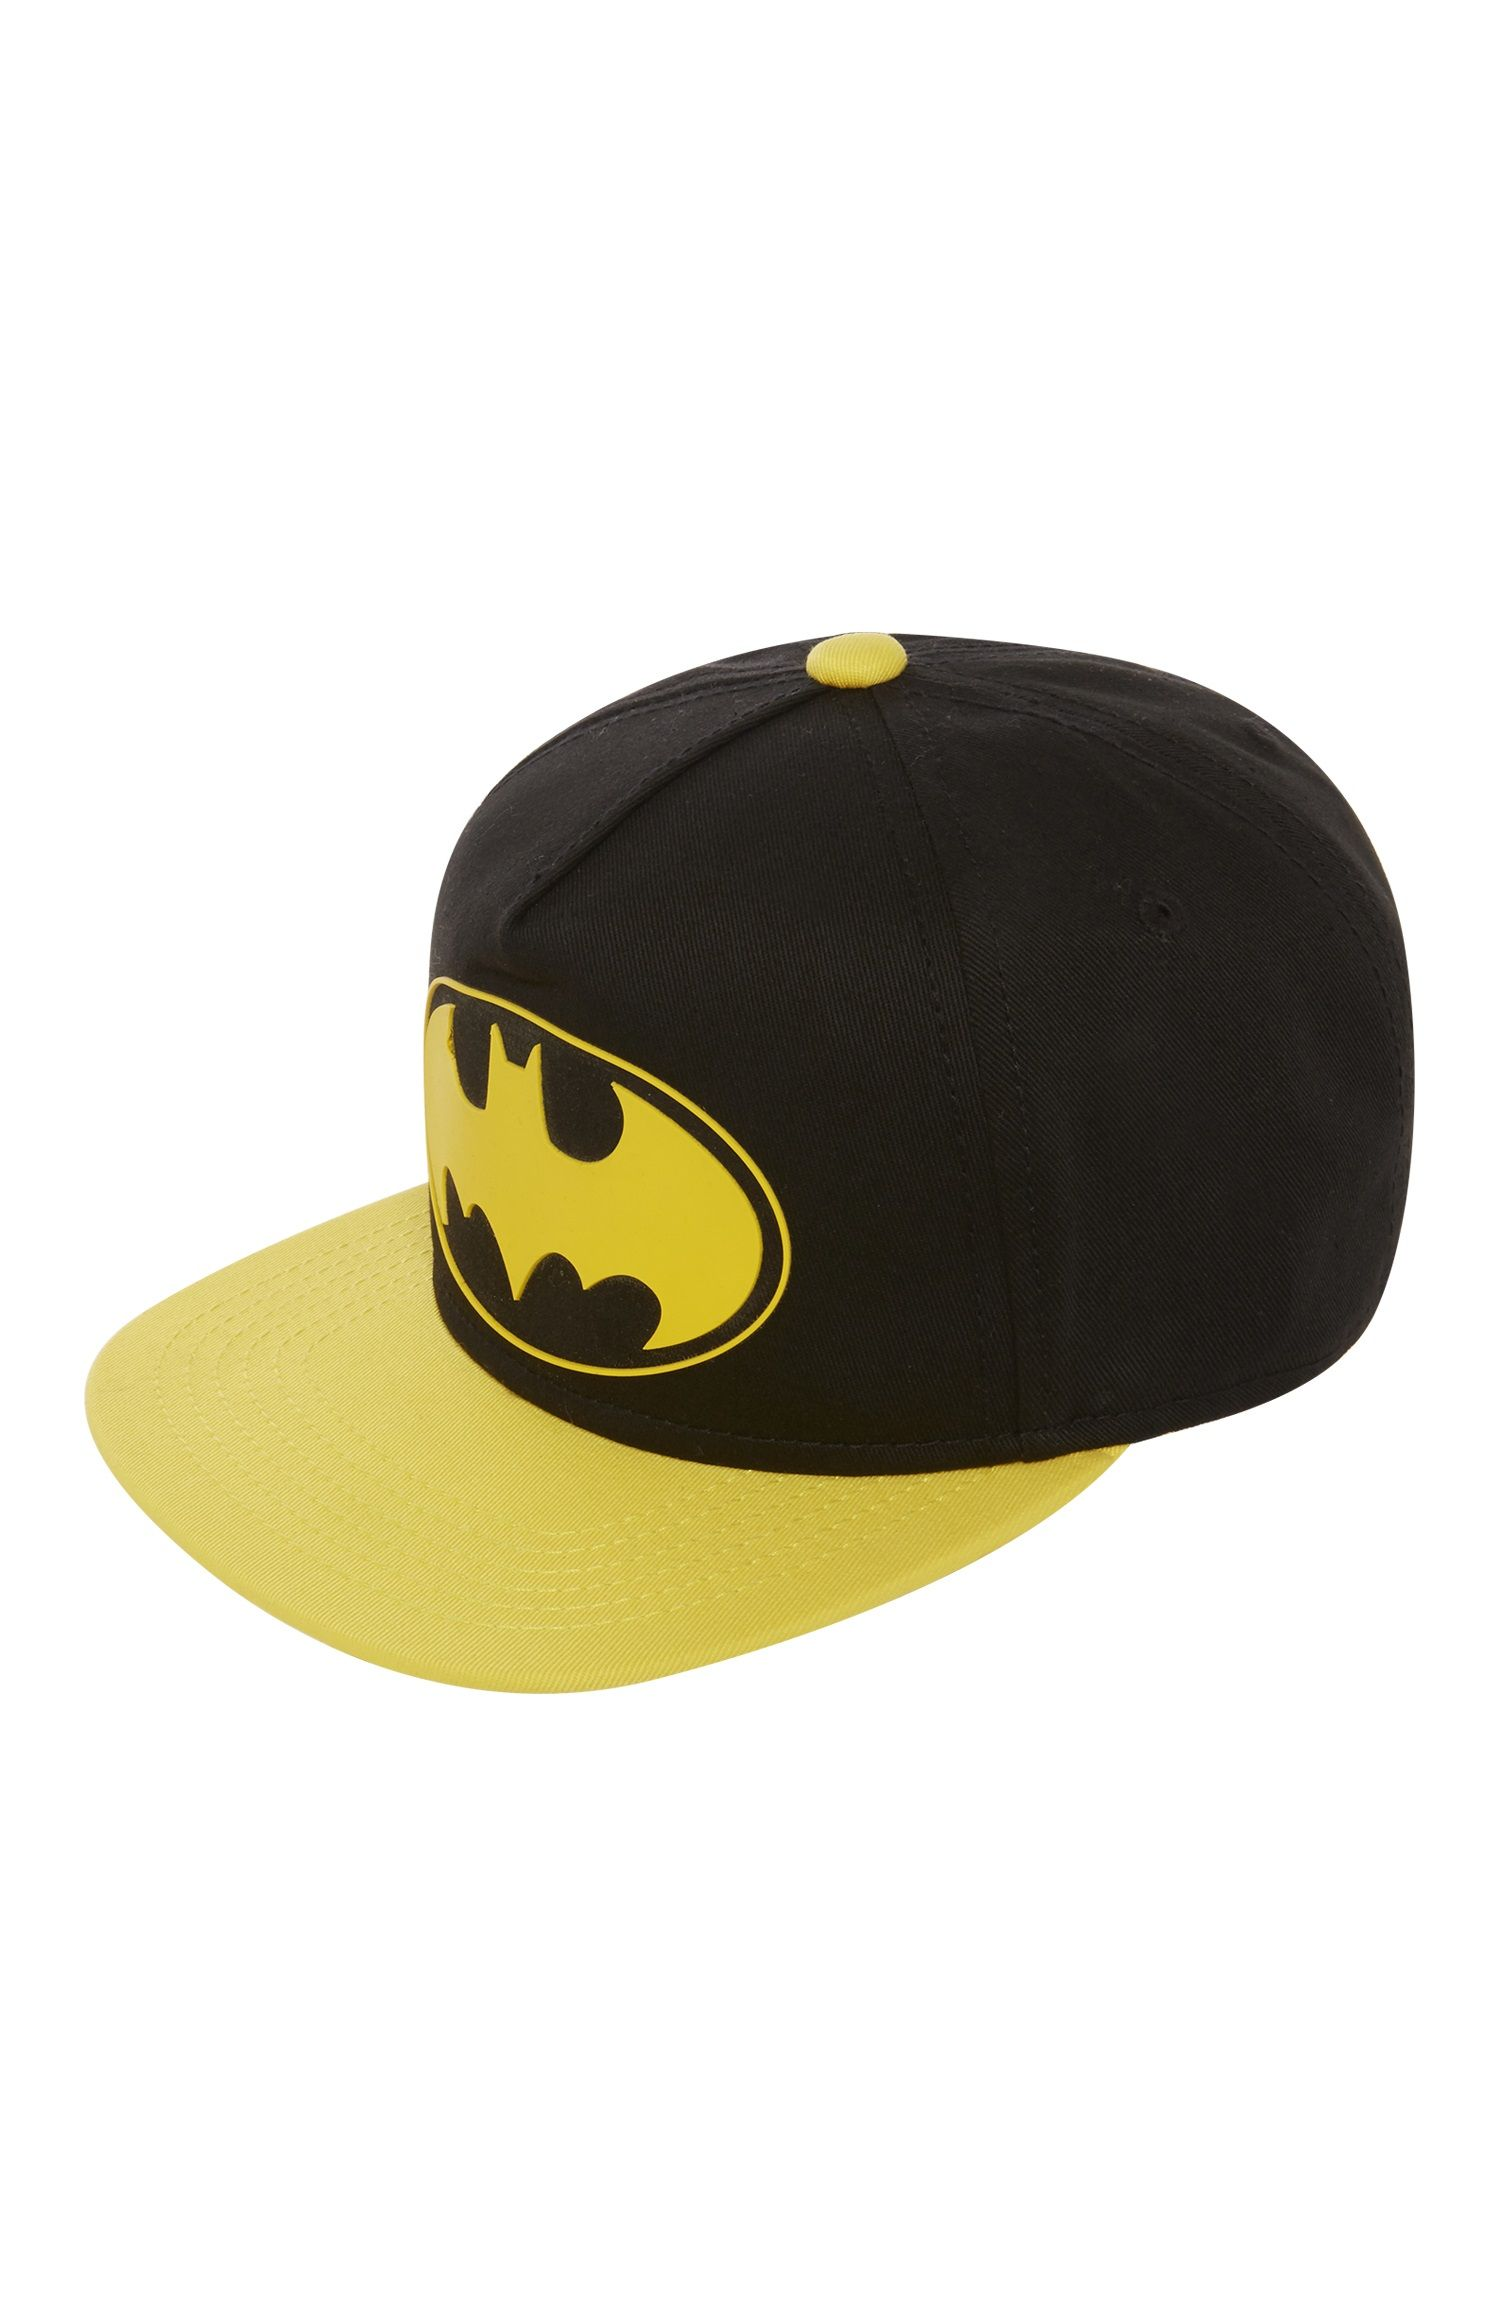 66db35fc6 Primark - Batman Logo Peak Hat | Batman | Batman logo, Hats, Batman